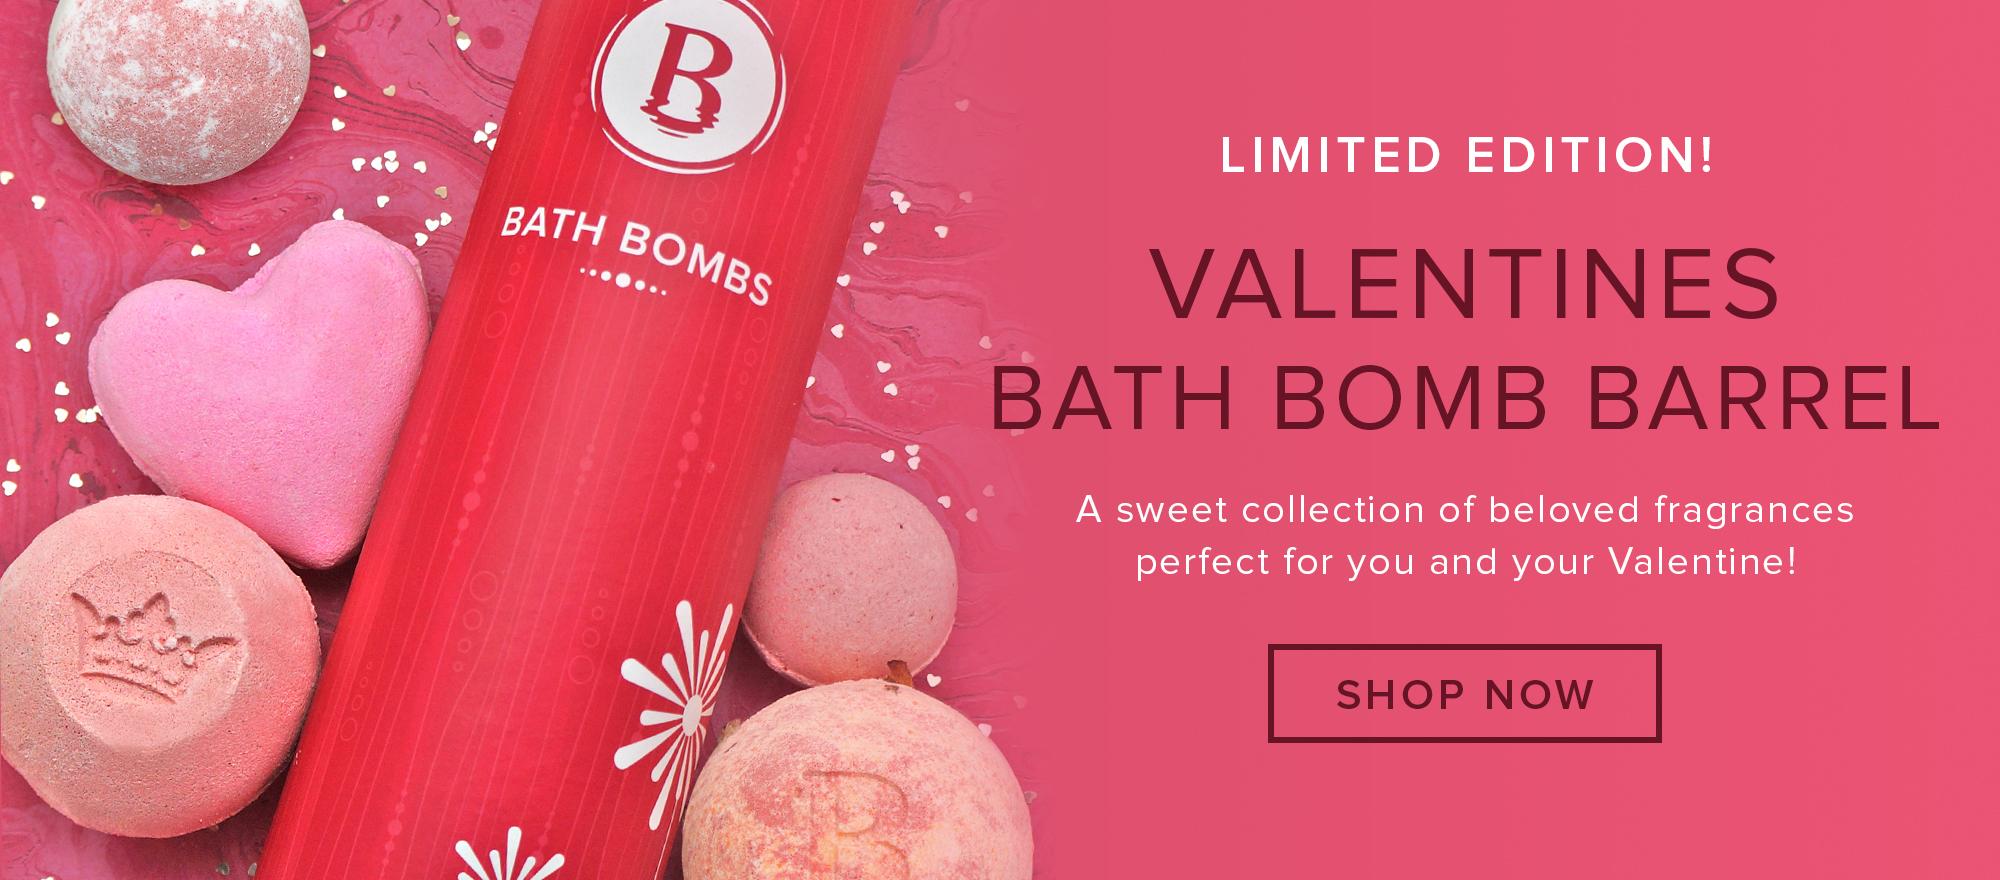 Valentines Bath Bomb Barrel